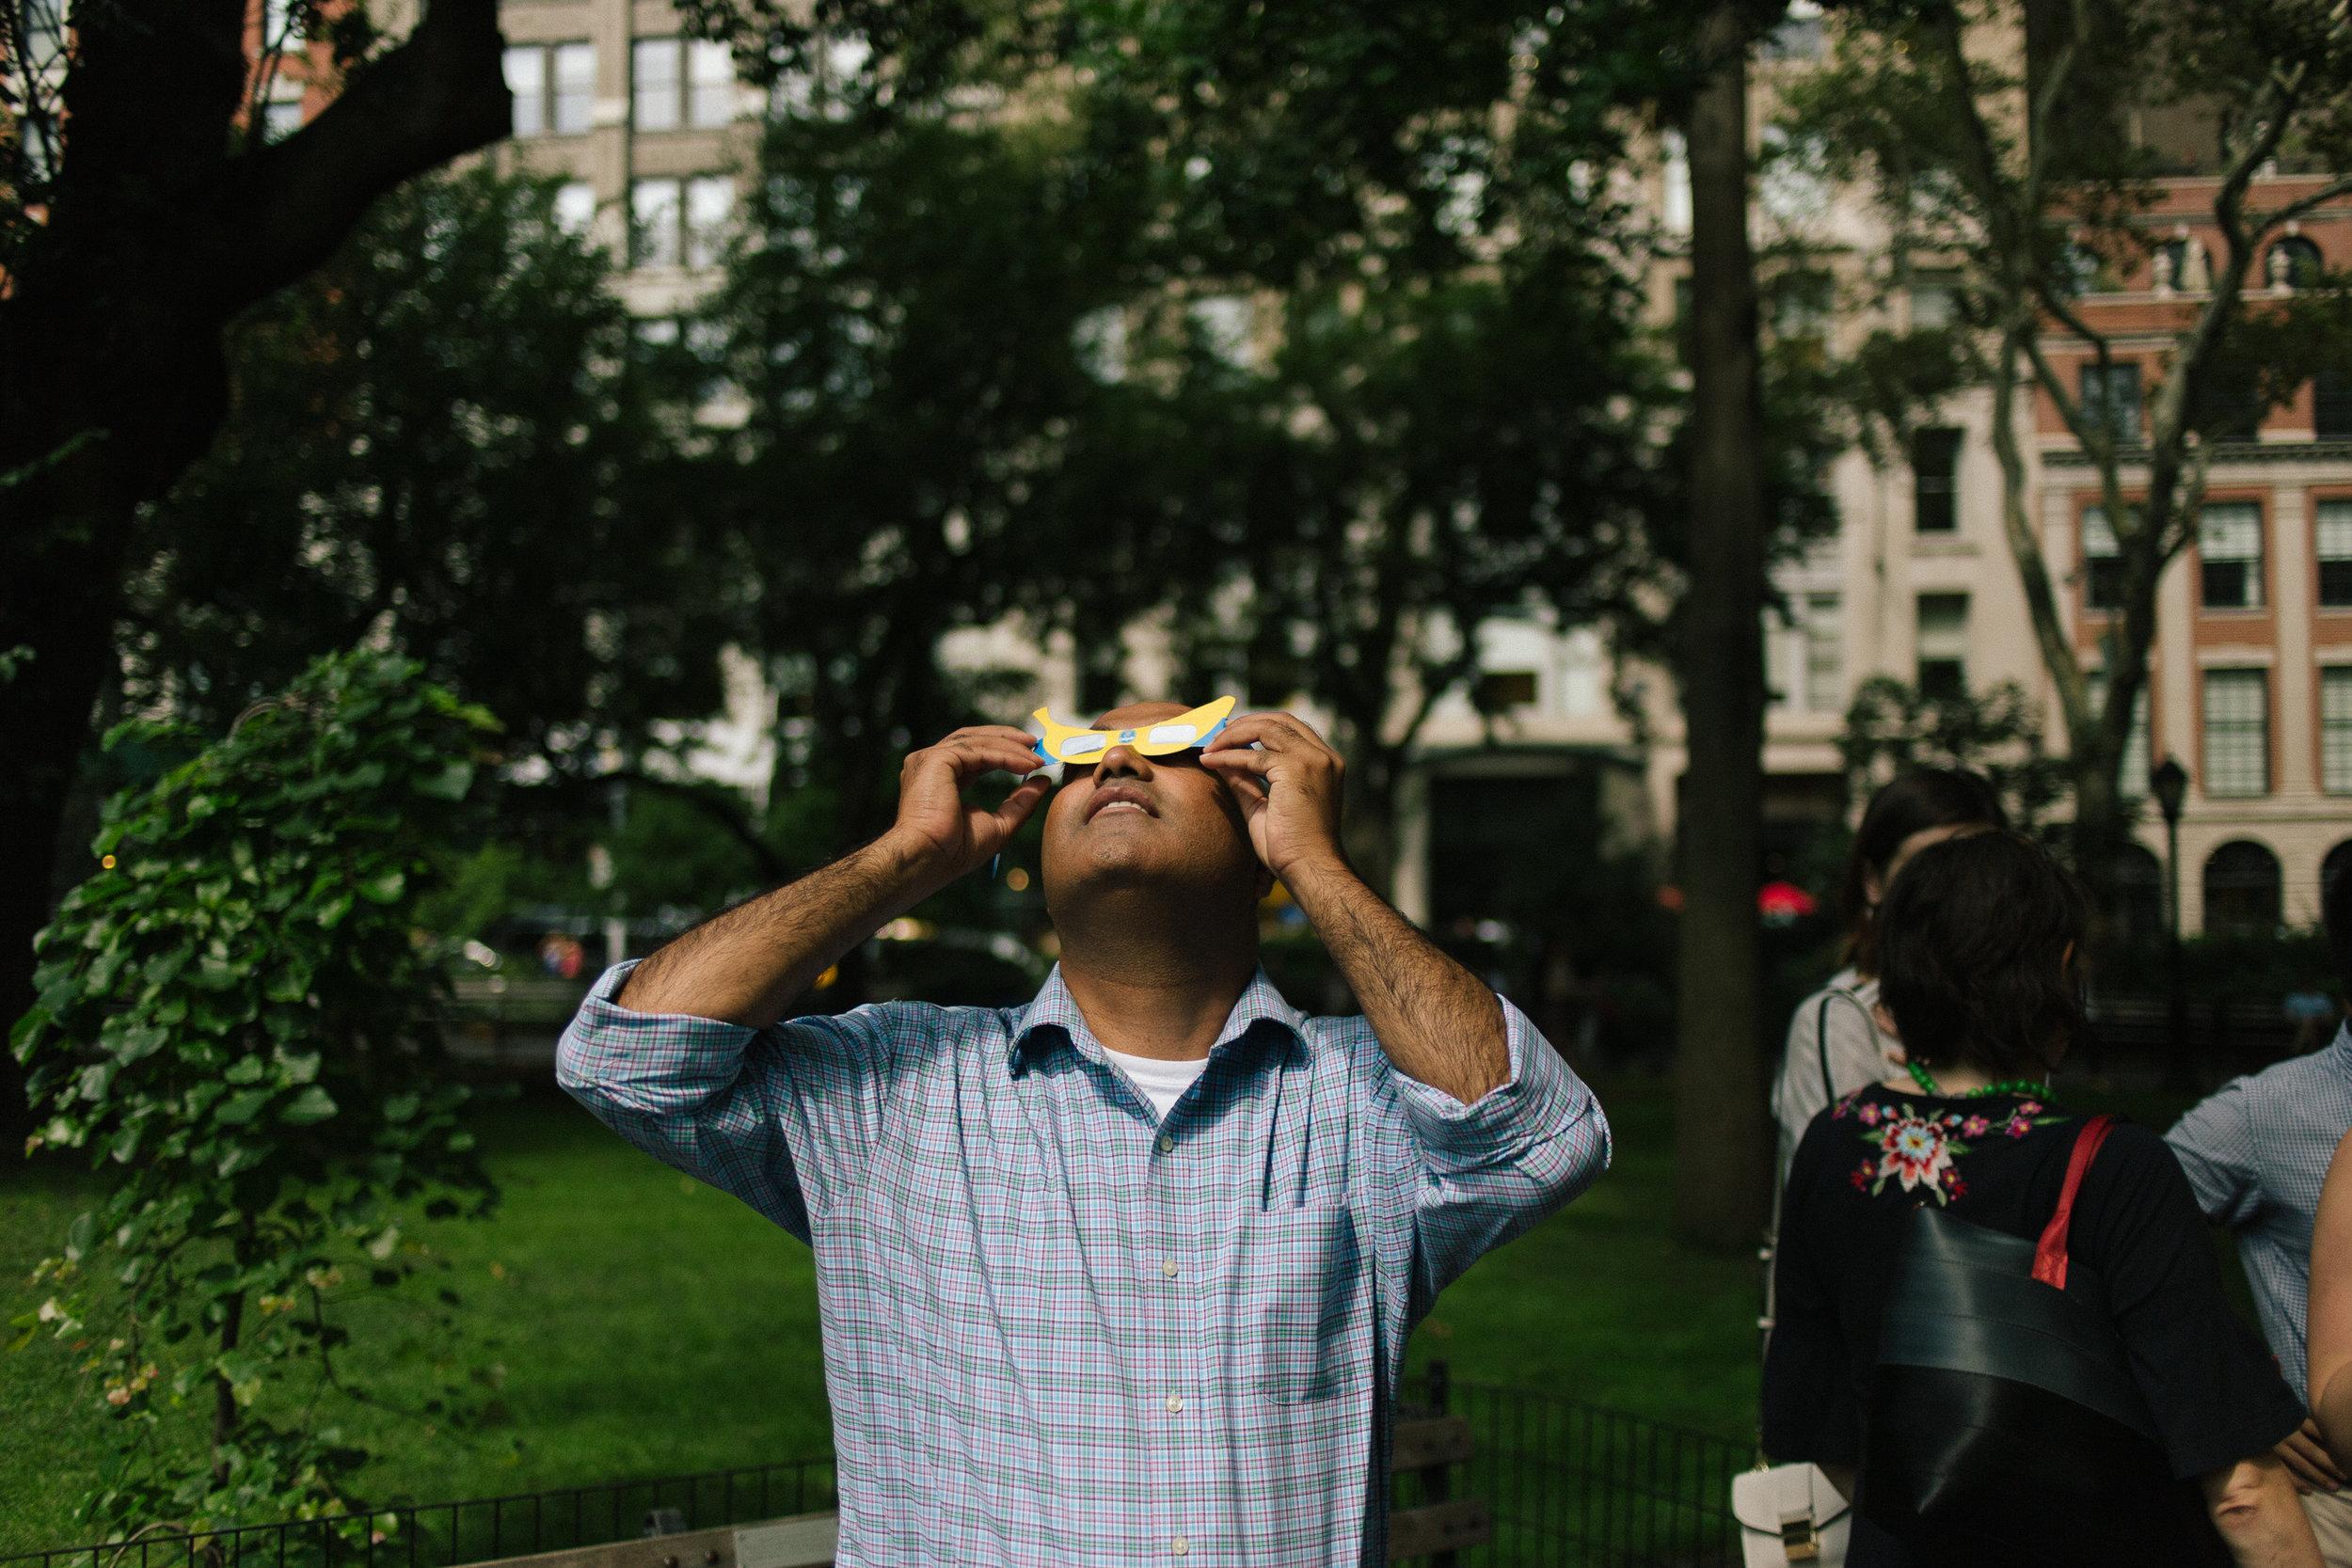 eclipse-nyc-2017-2367.jpg